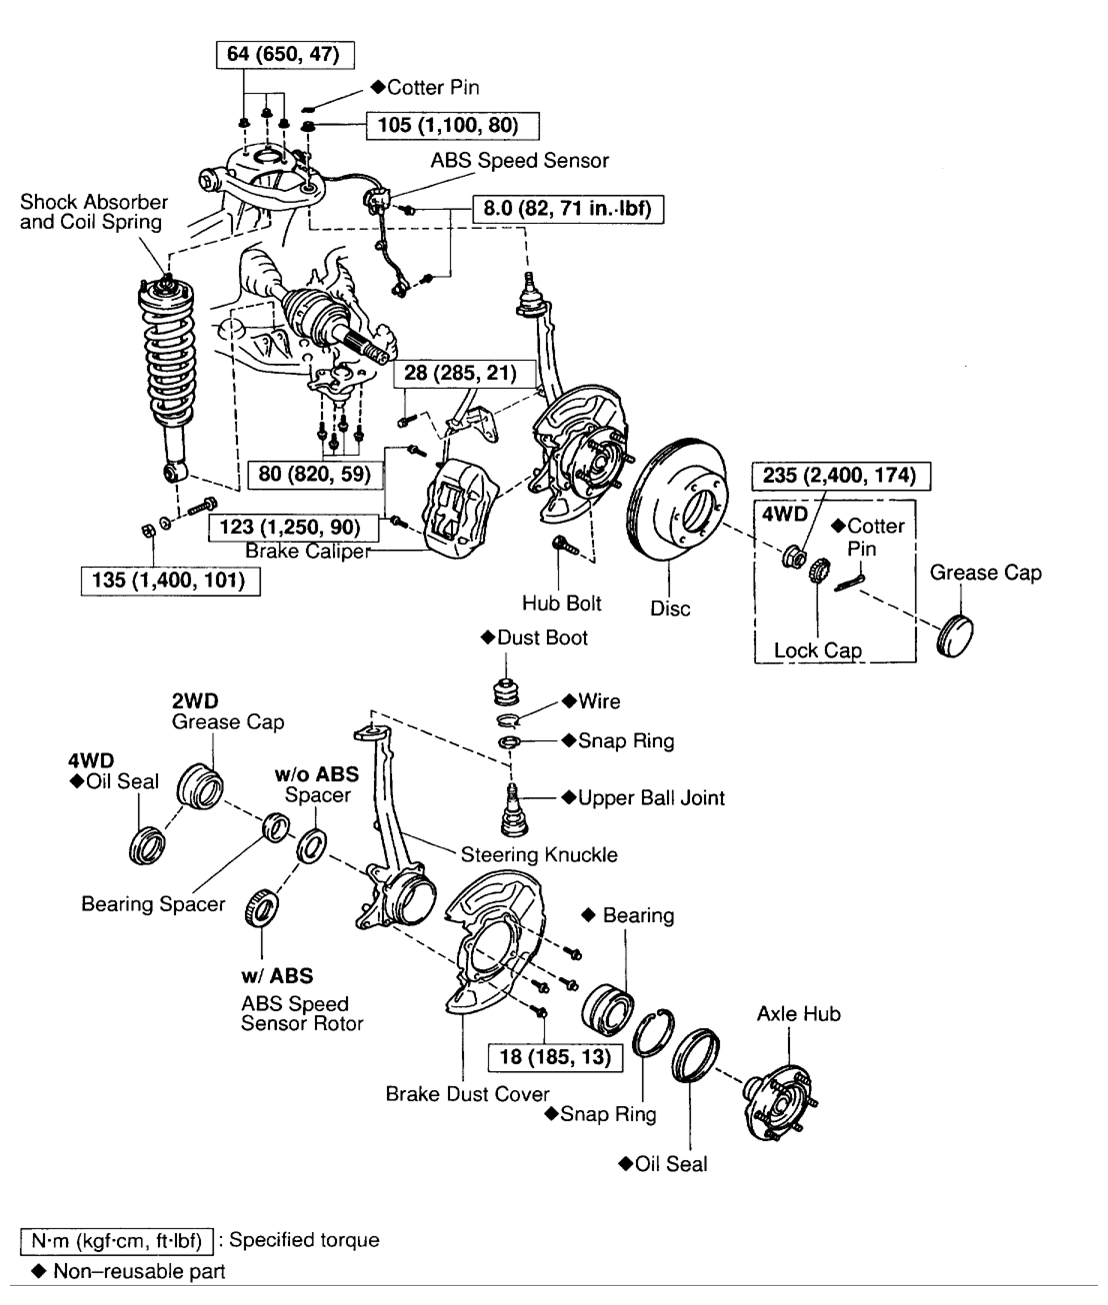 1997 hyundai accent fuse diagram wiring diagram database 2001 Kia Sportage Engine Diagram diagram as well 2001 toyota tundra wiring diagram on toyota tundra 2001 hyundai accent transmission diagram 1997 hyundai accent fuse diagram